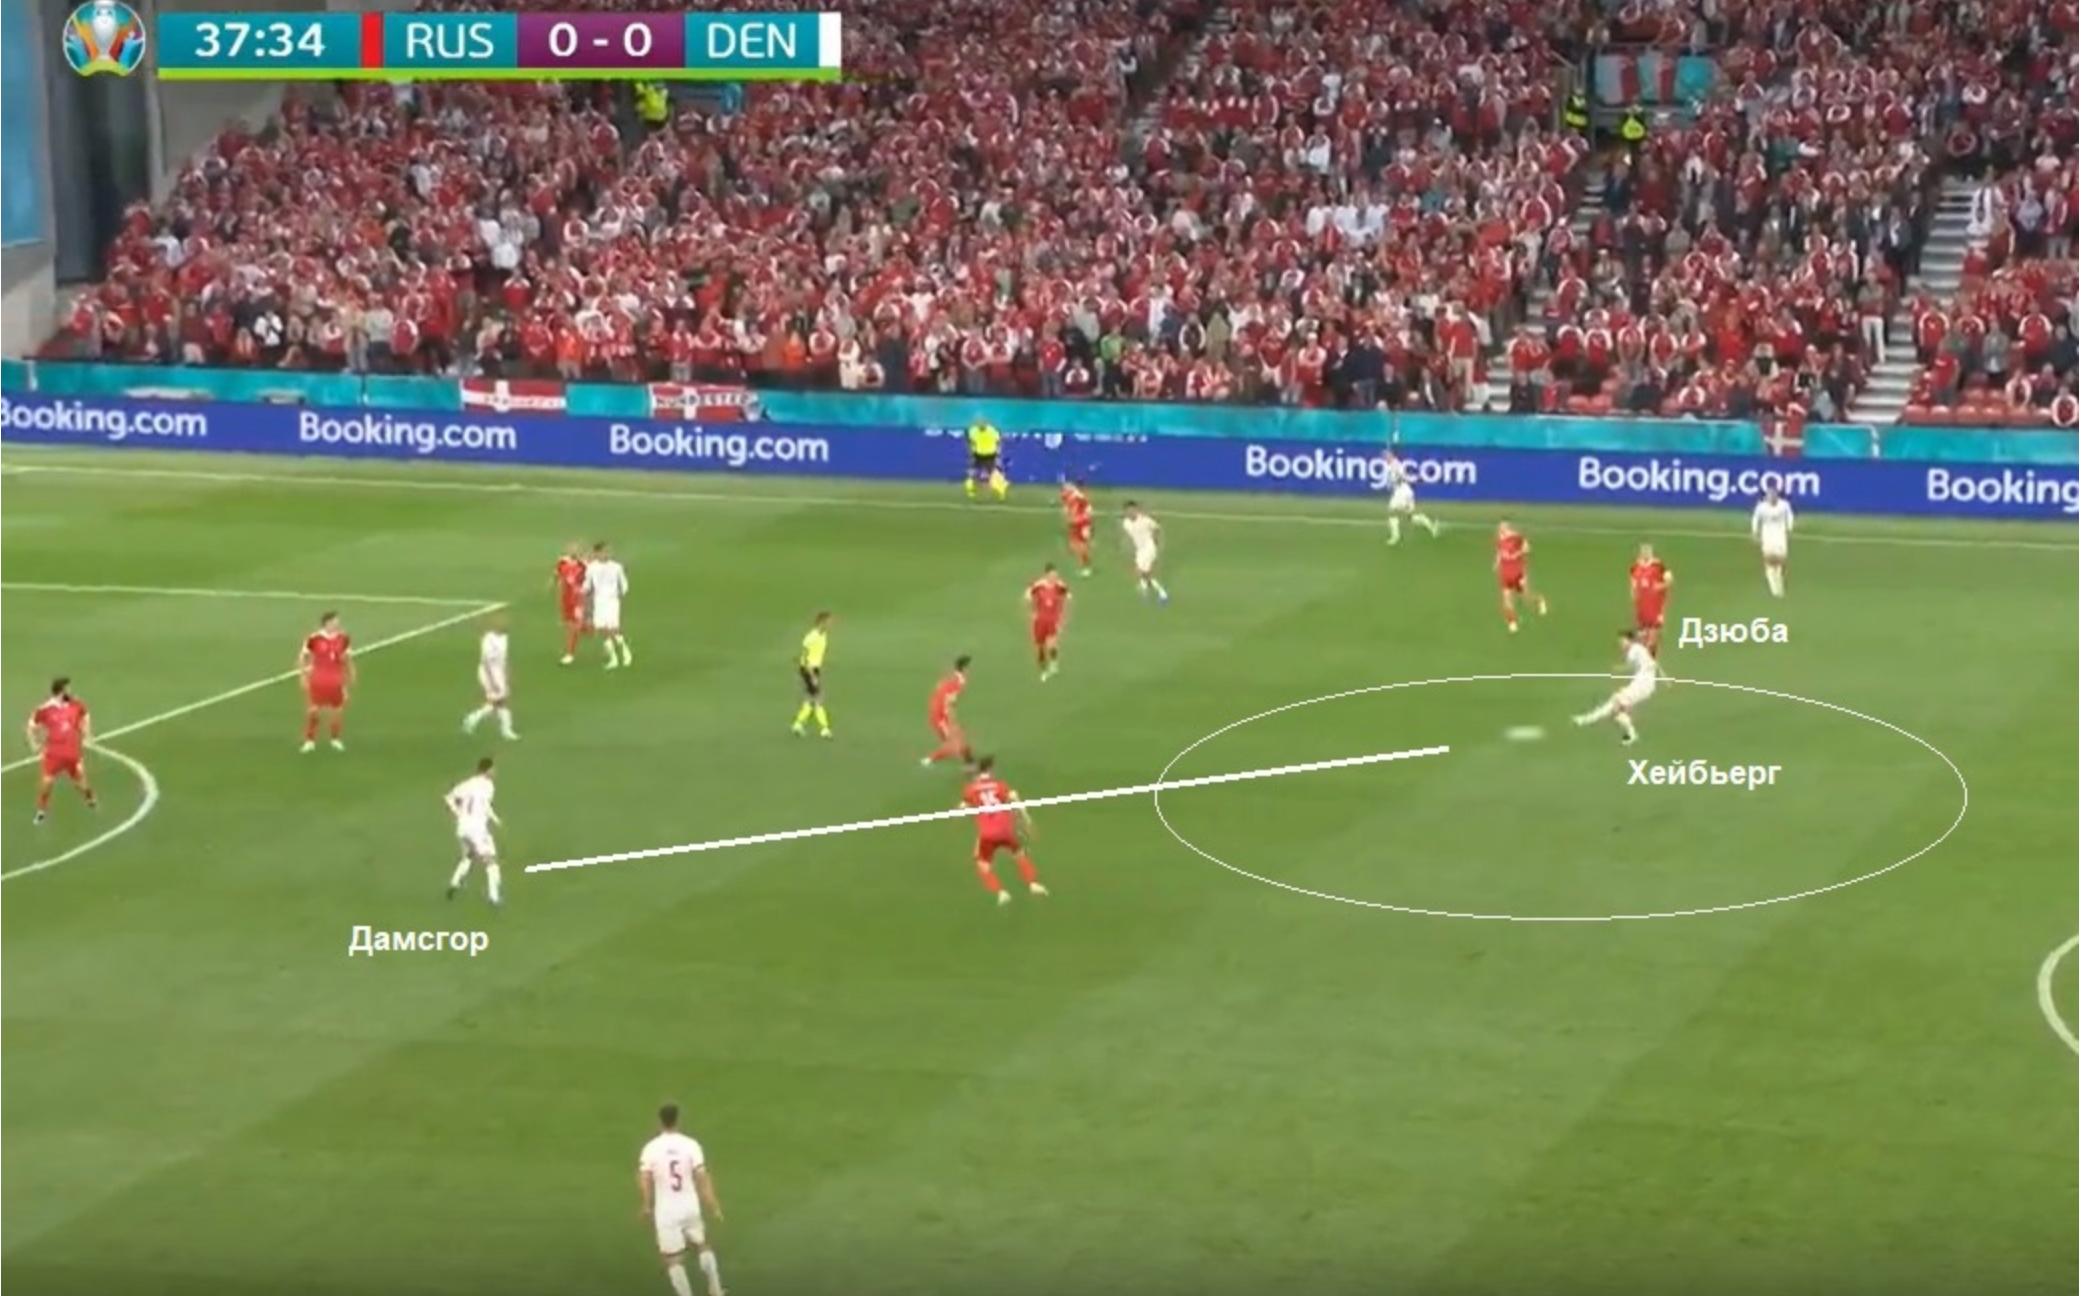 Фото:Момент первого гола (Скриншот)